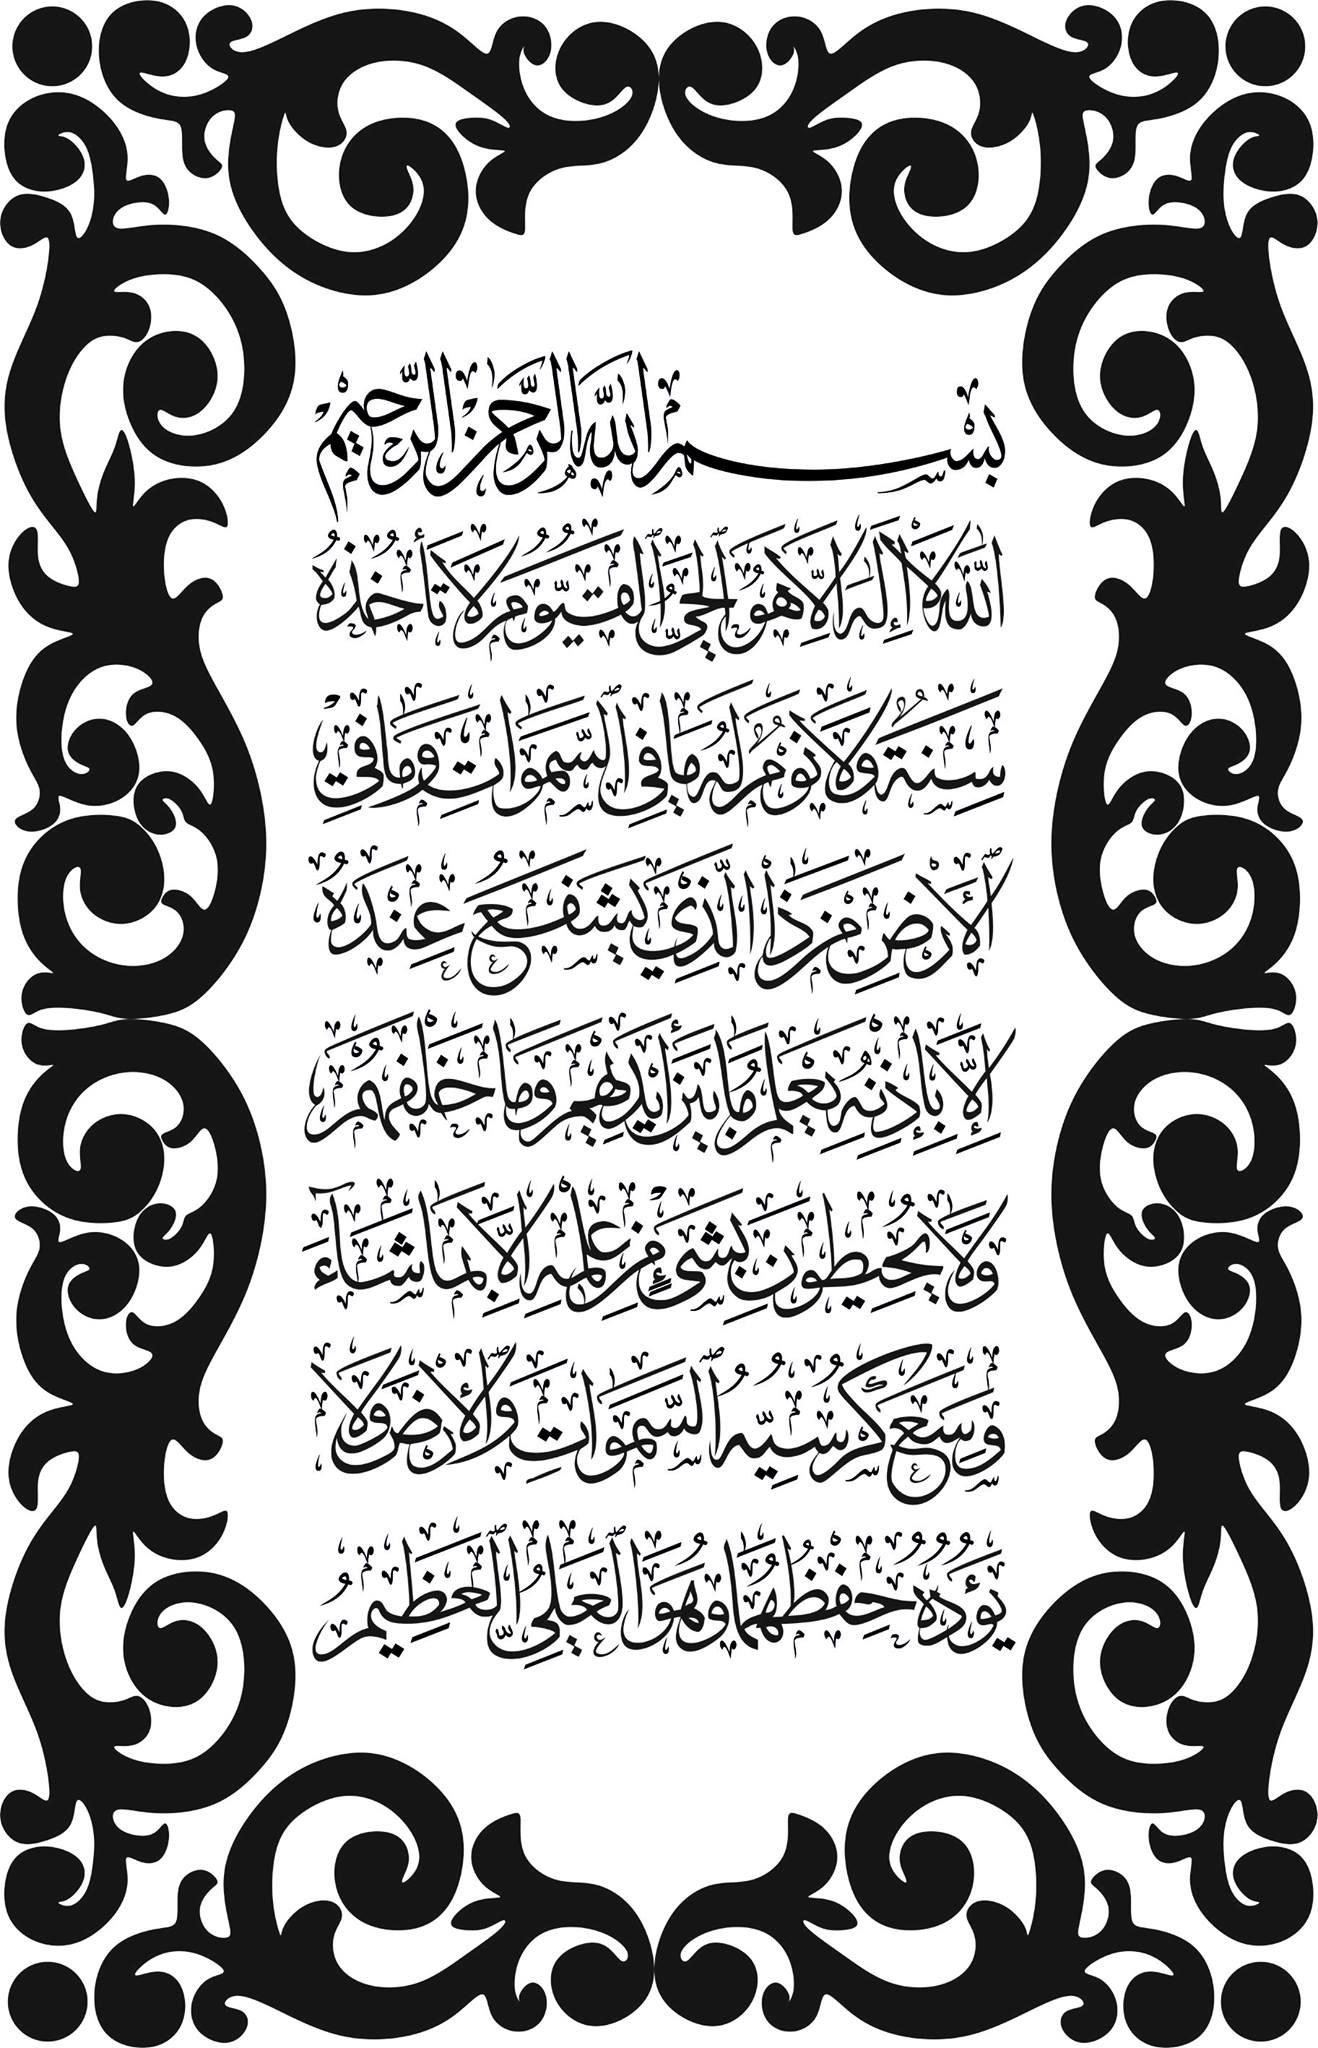 Kaligrafi Ayat Kursi Hd : kaligrafi, kursi, Kursi, Islamic, Vector, Image, Calligraphy, (#585426), Wallpaper, Backgrounds, Download